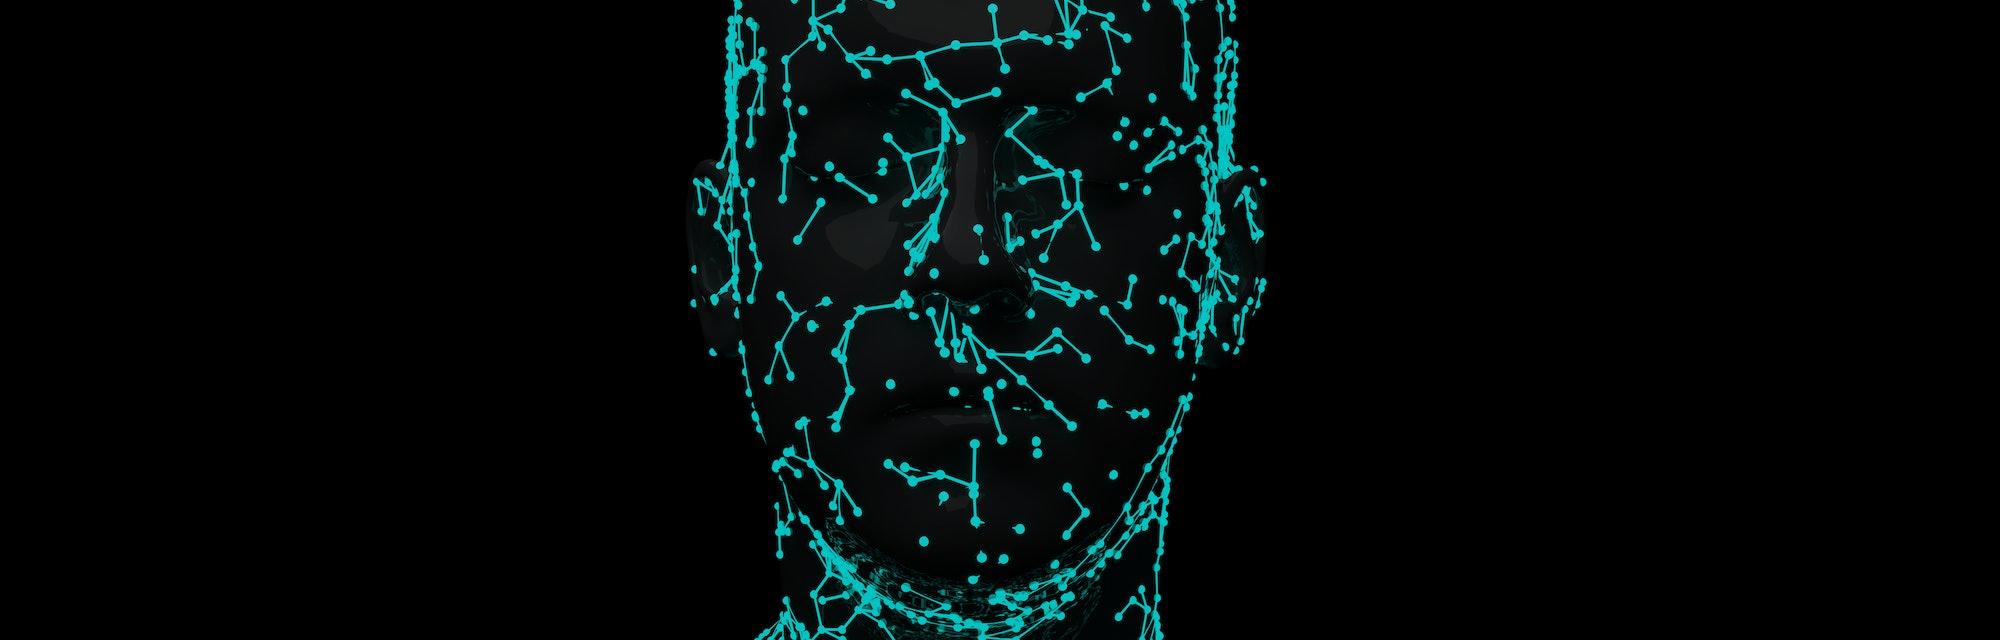 Facial Recognition System 3d illustration